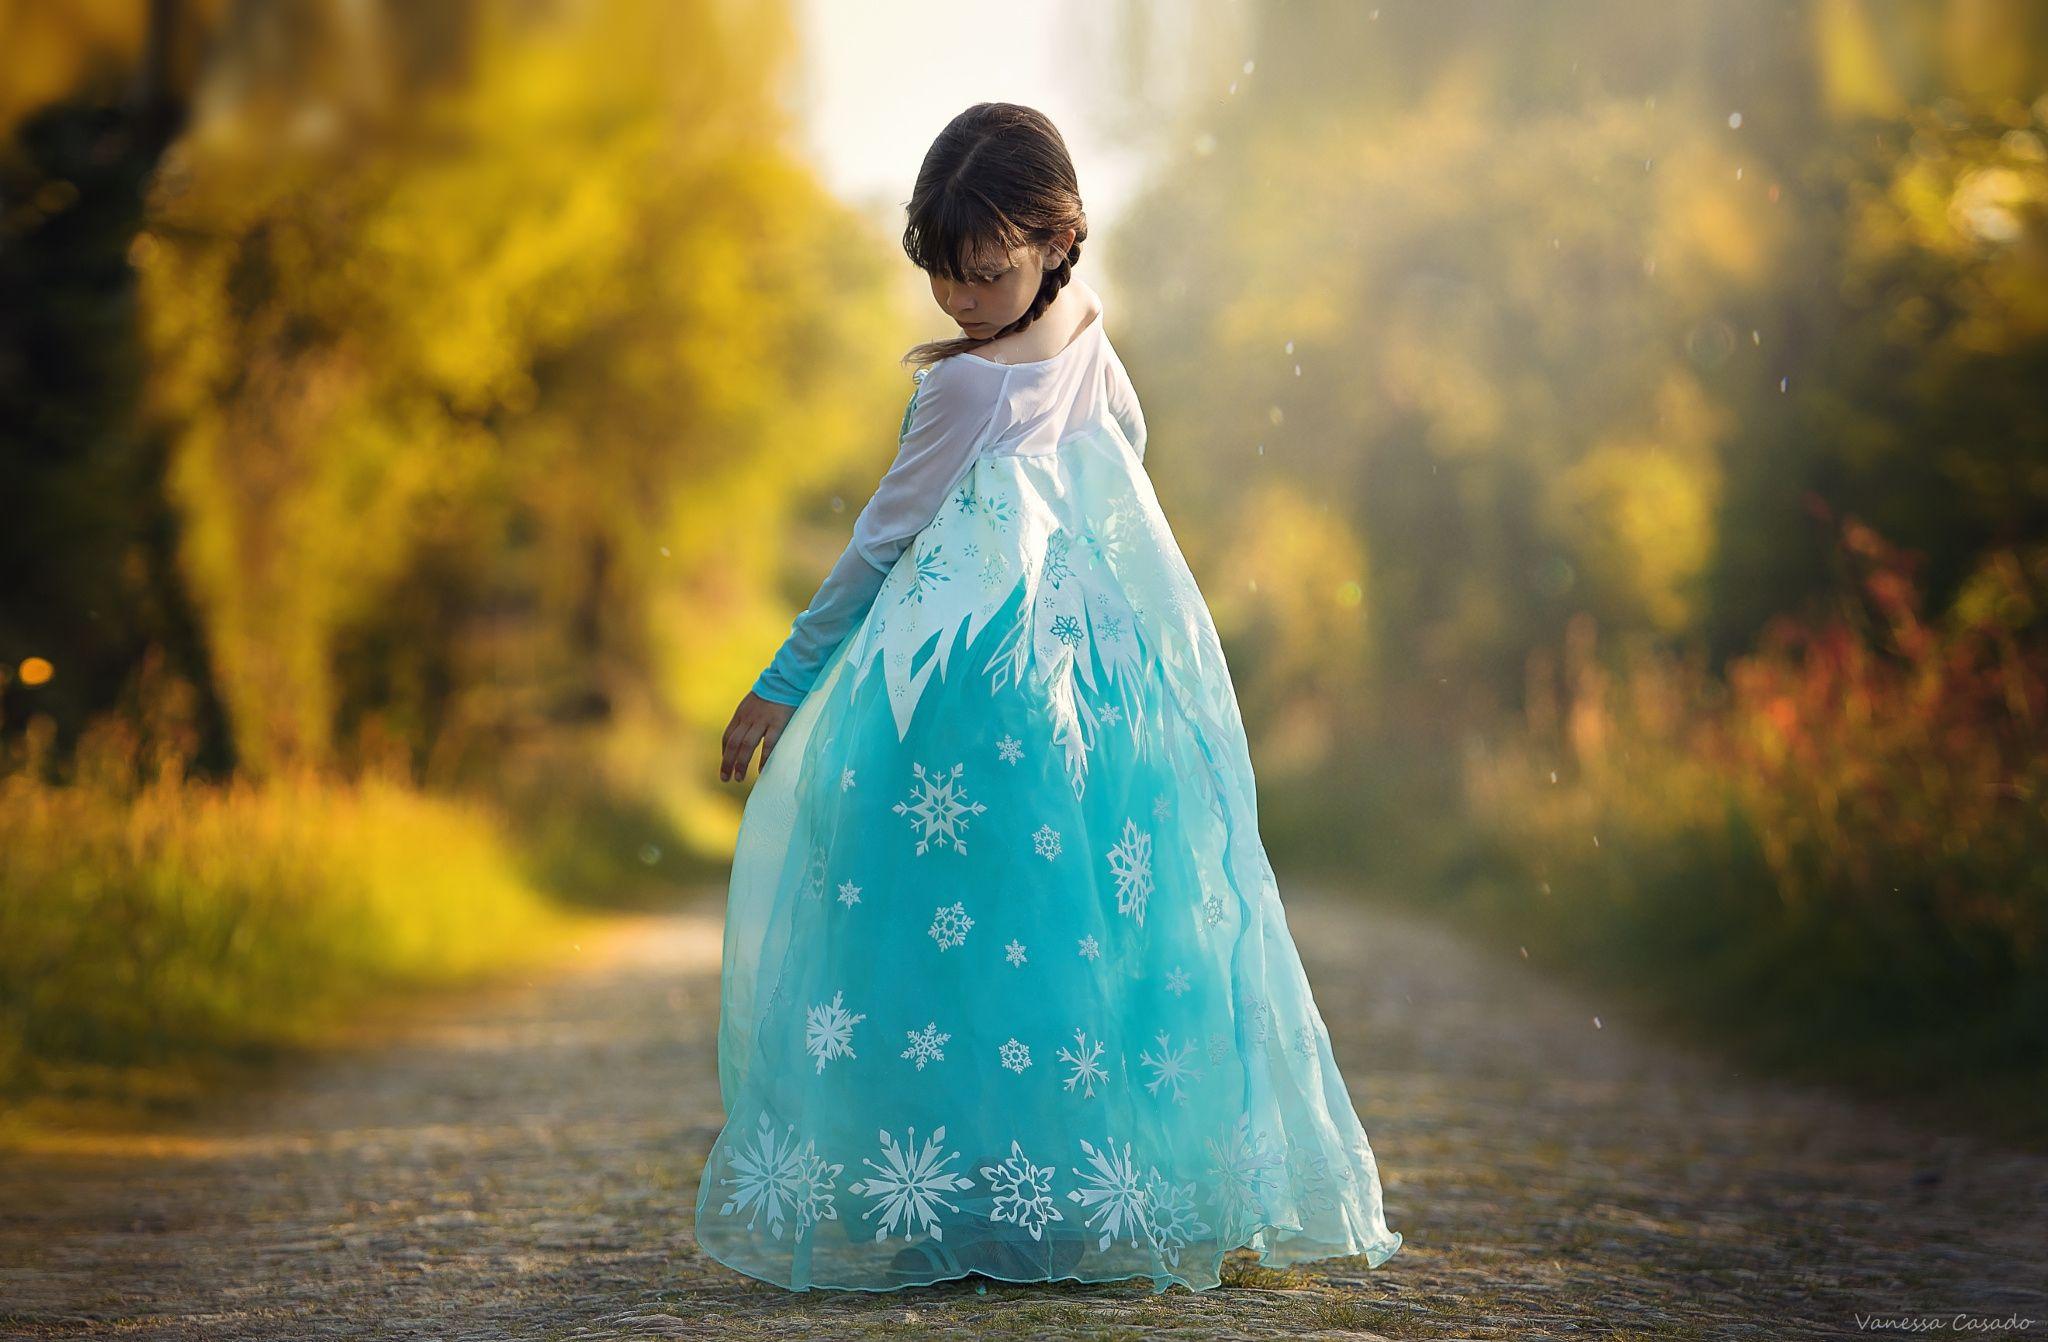 * Princess * by Vanessa Casado on 500px